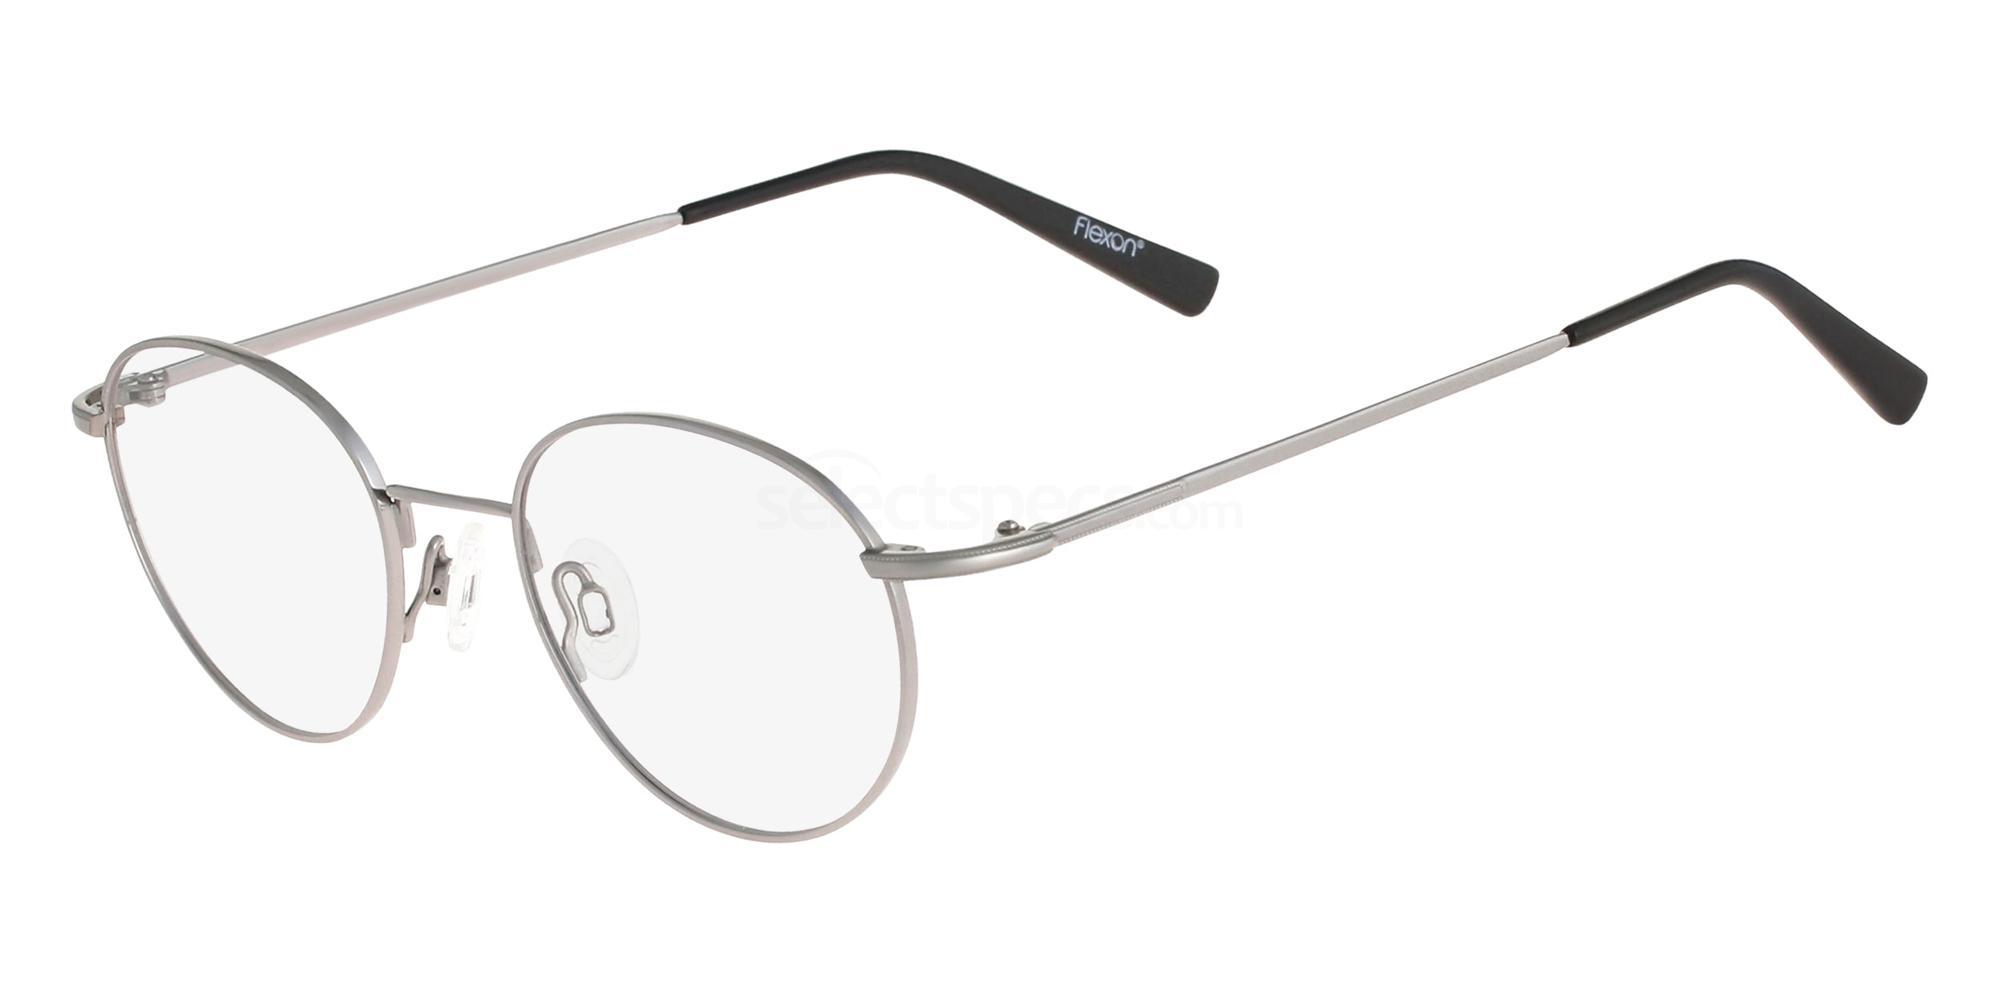 003 FLEXON EDISON 600 Glasses, Flexon